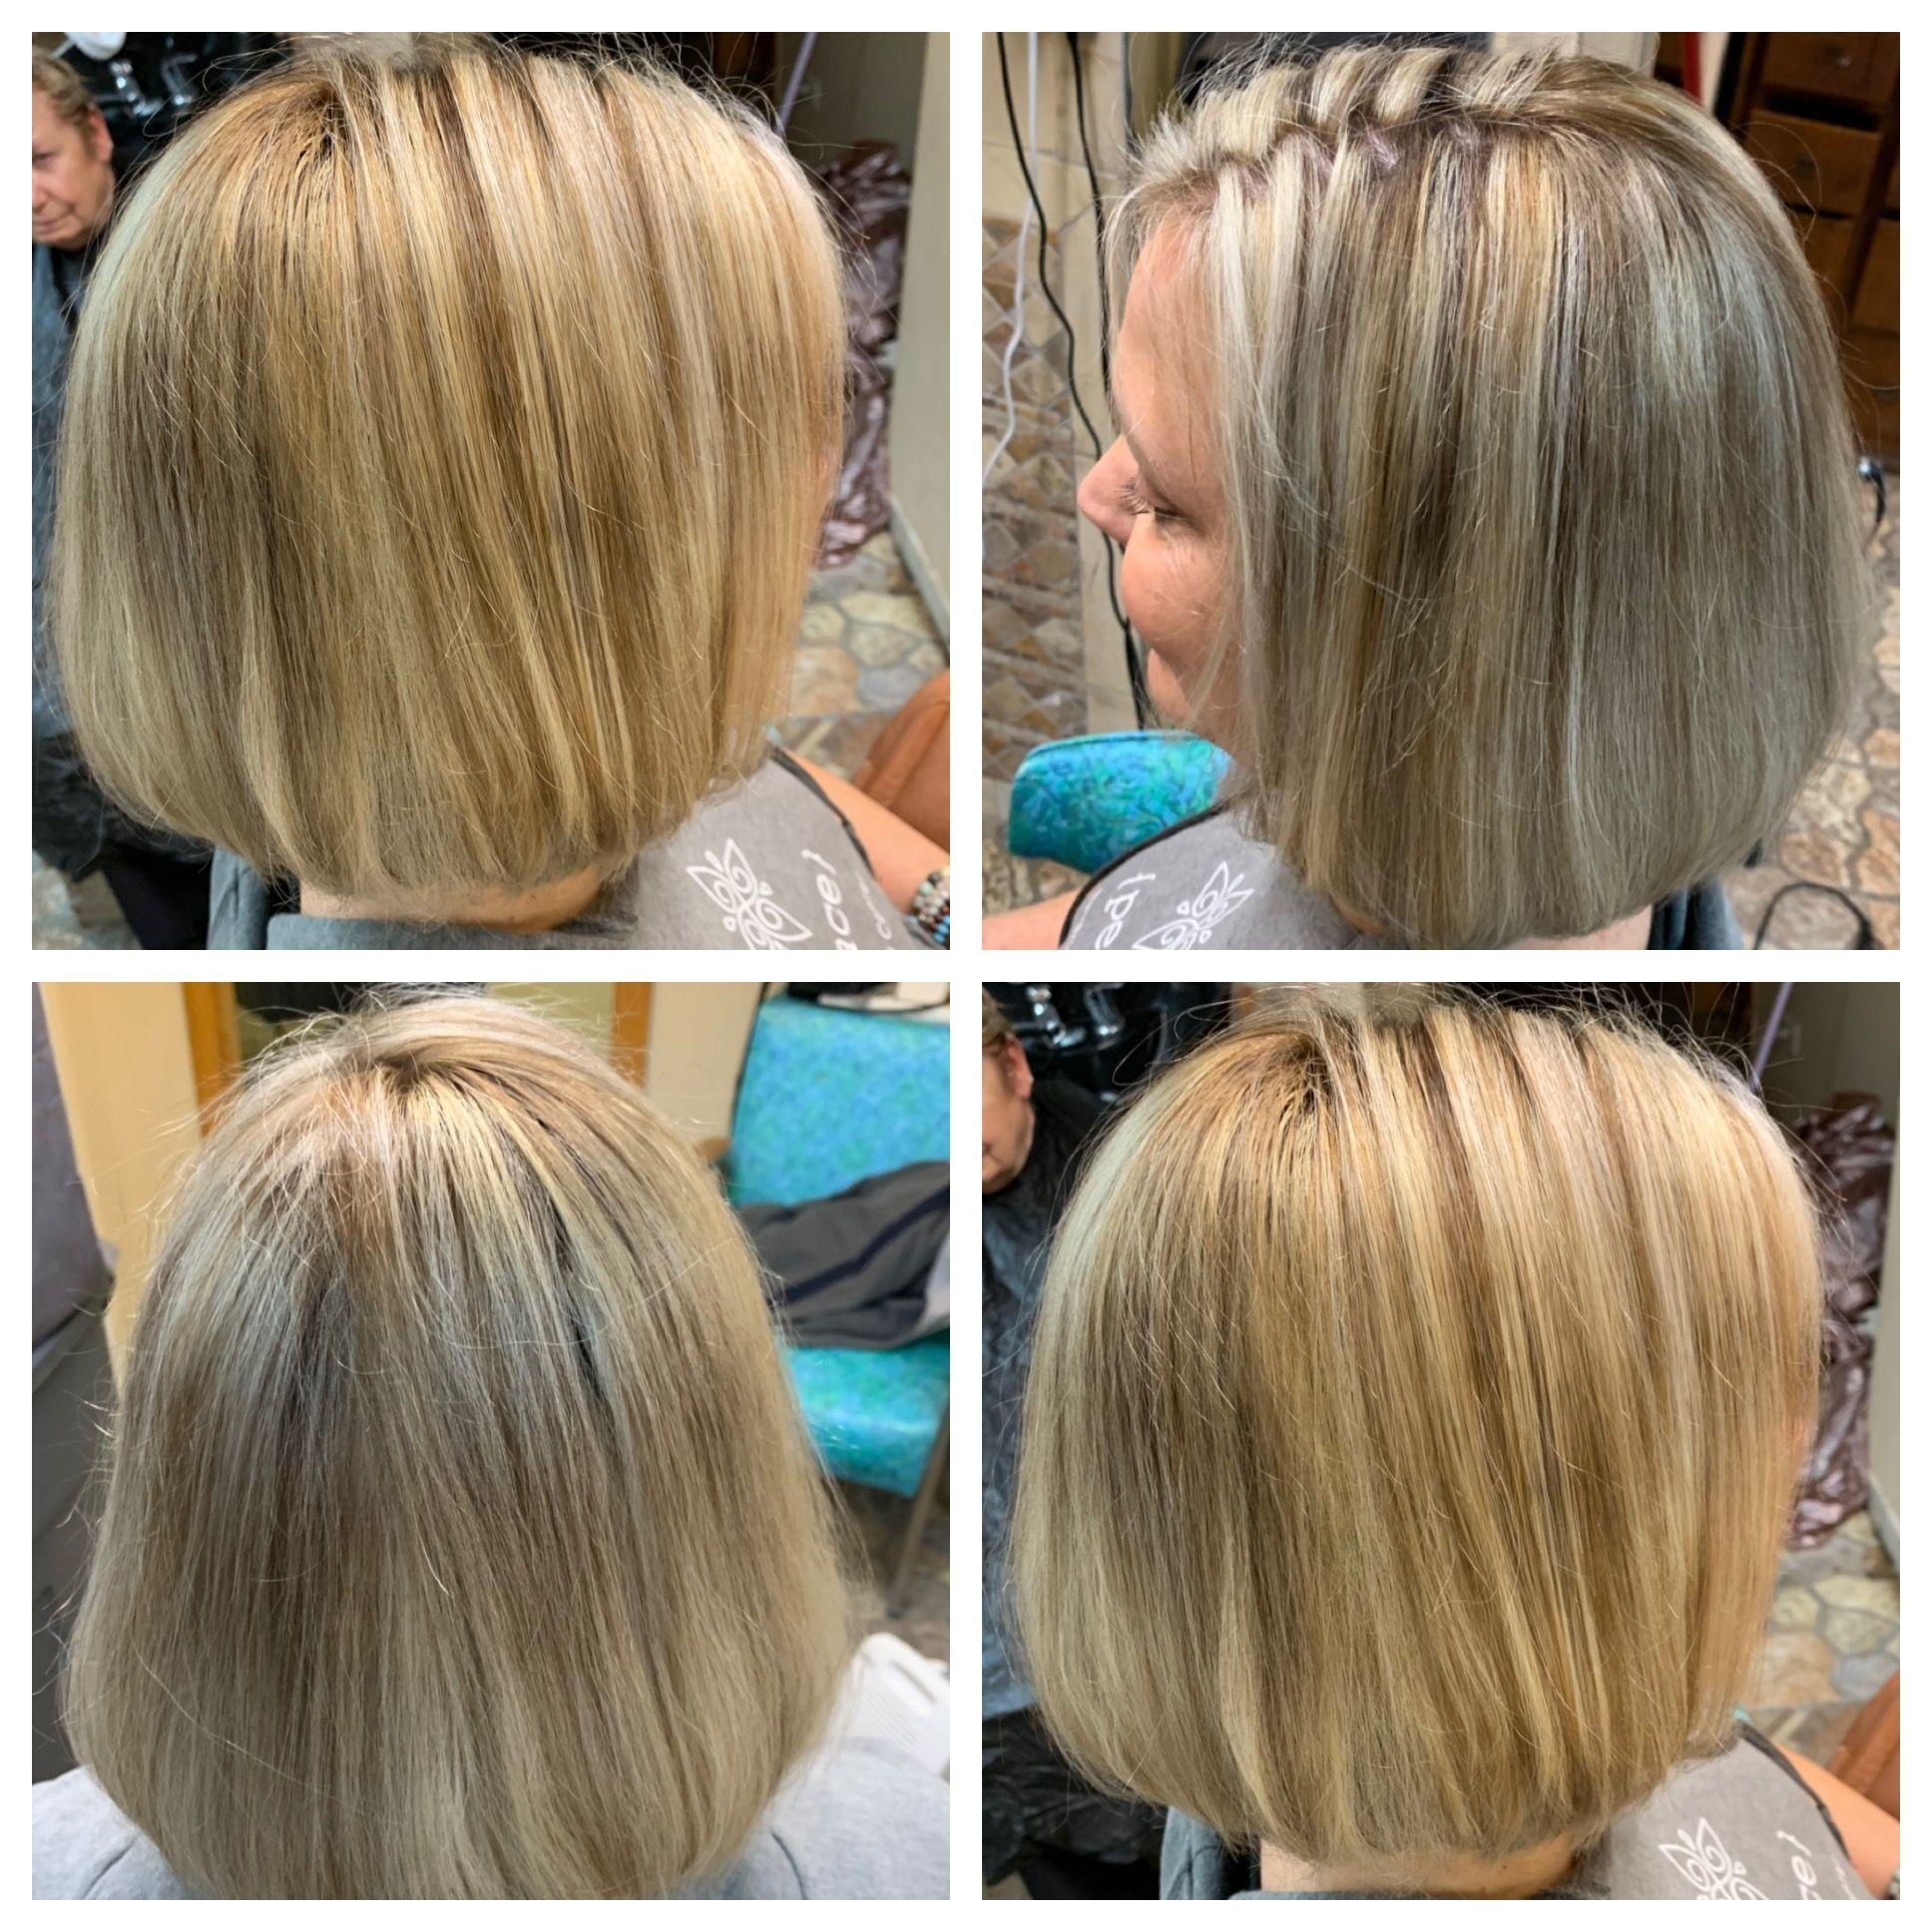 Pin by Deb Measner on Hair2Dye4 | Hair styles, Long hair ...